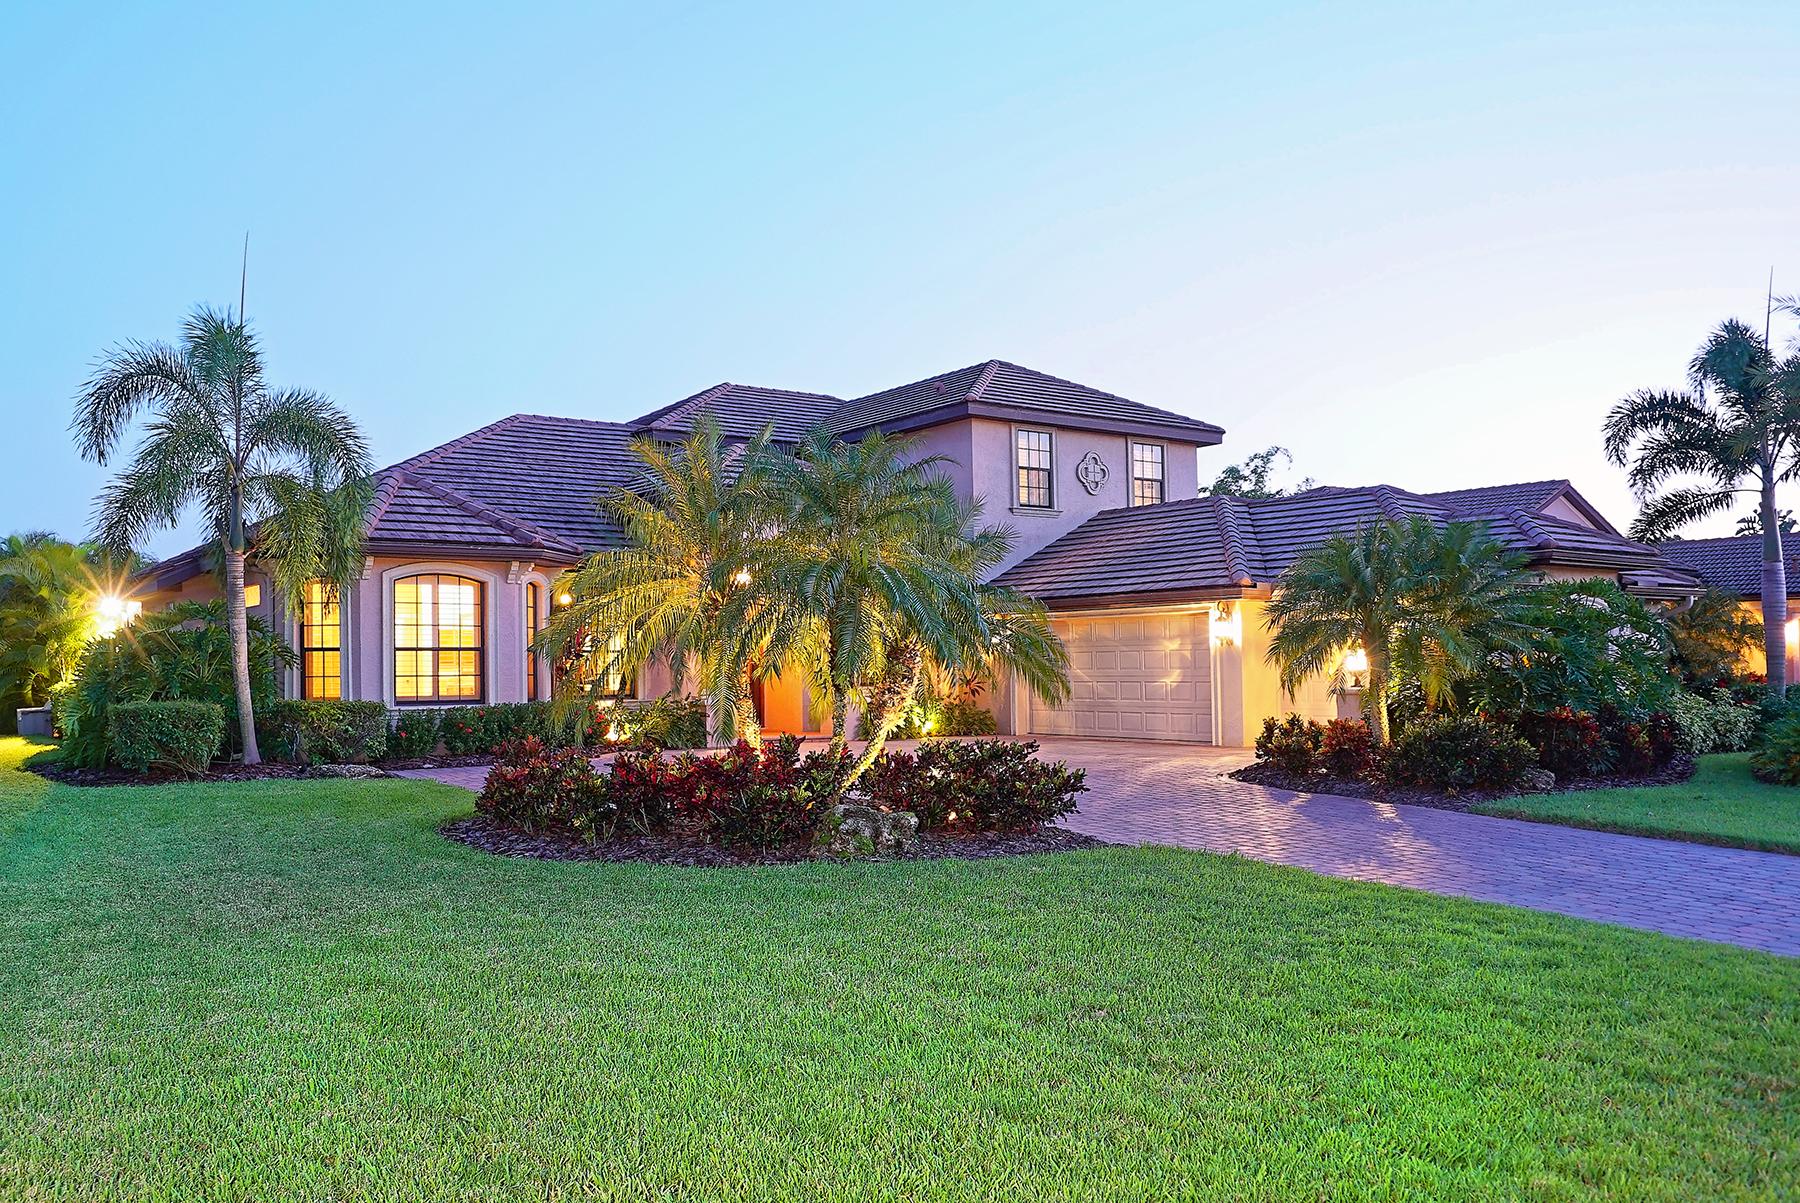 Single Family Home for Sale at SARASOTA 7964 Megan Hammock Way Sarasota, Florida, 34240 United States